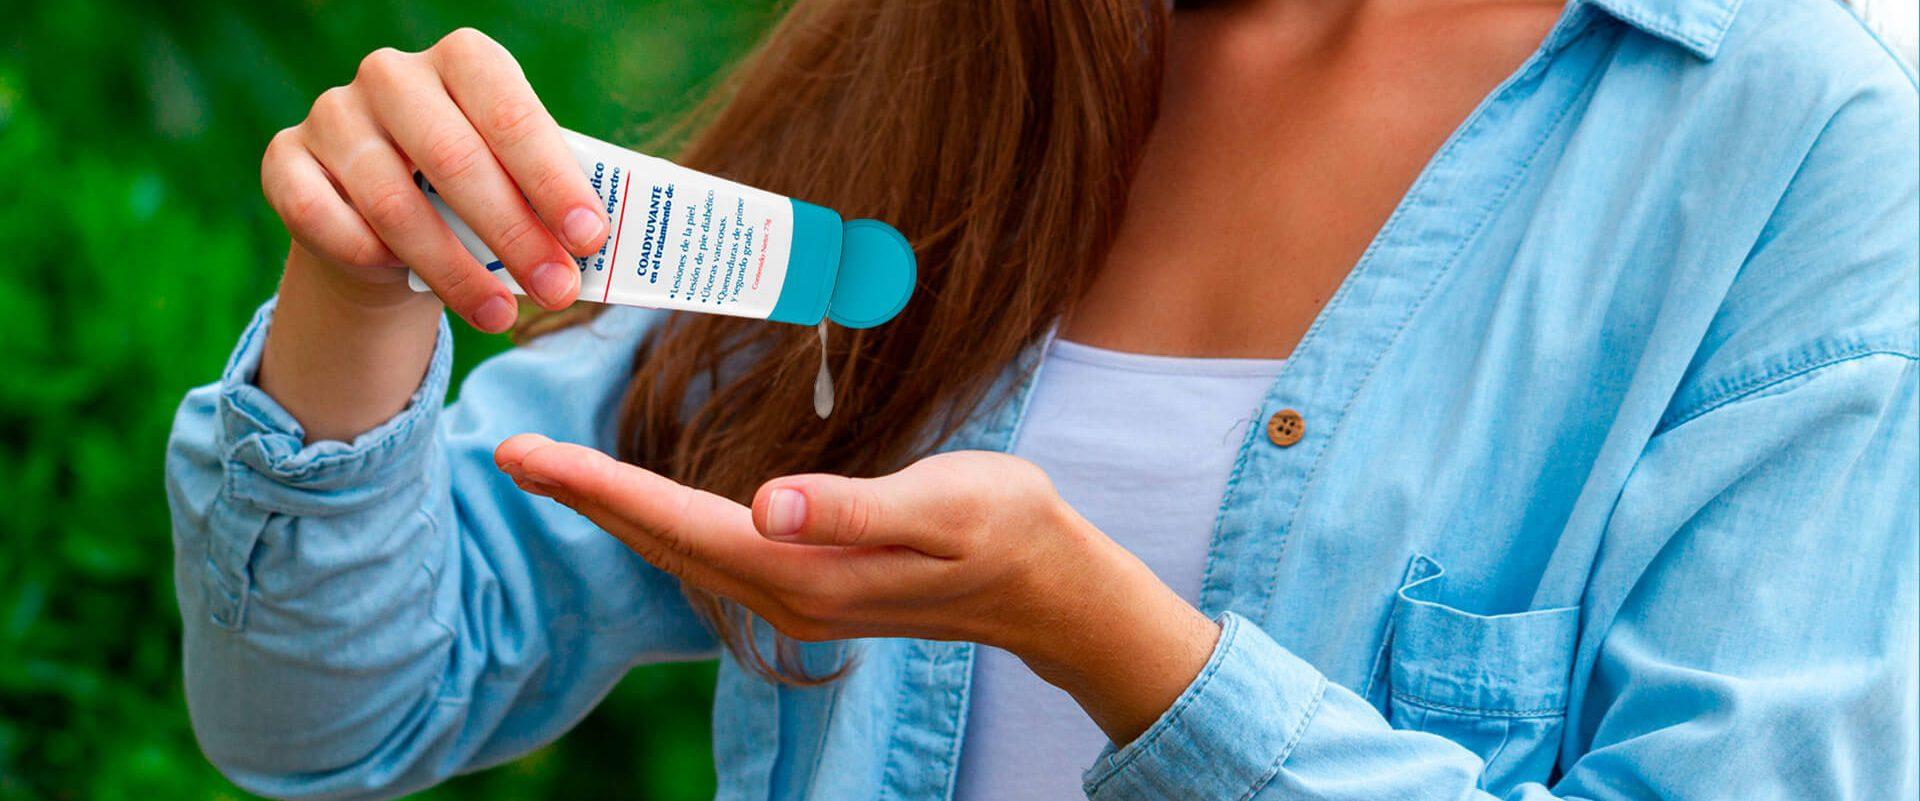 VibaC 30 desinfectante en gel